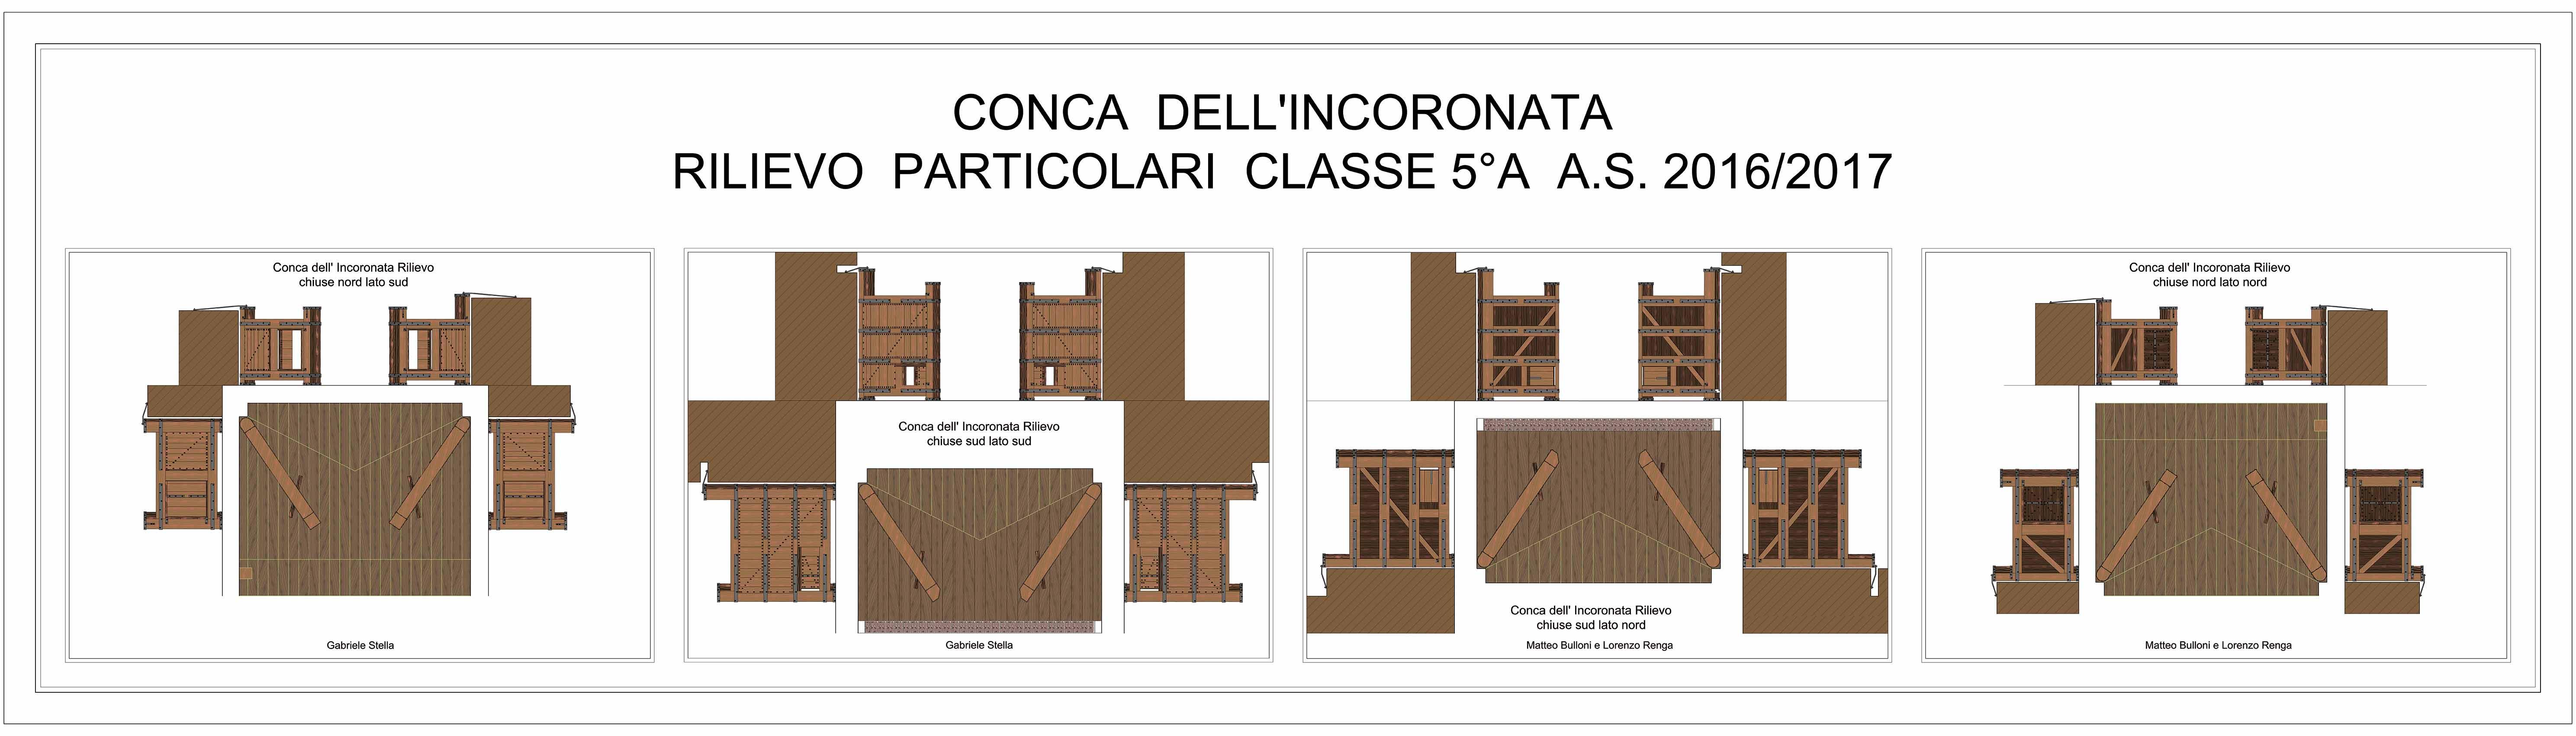 C:\001 Giuseppe\Lavori\LAS\AS16-17\5A\RilConca\Chiuse Model (1)